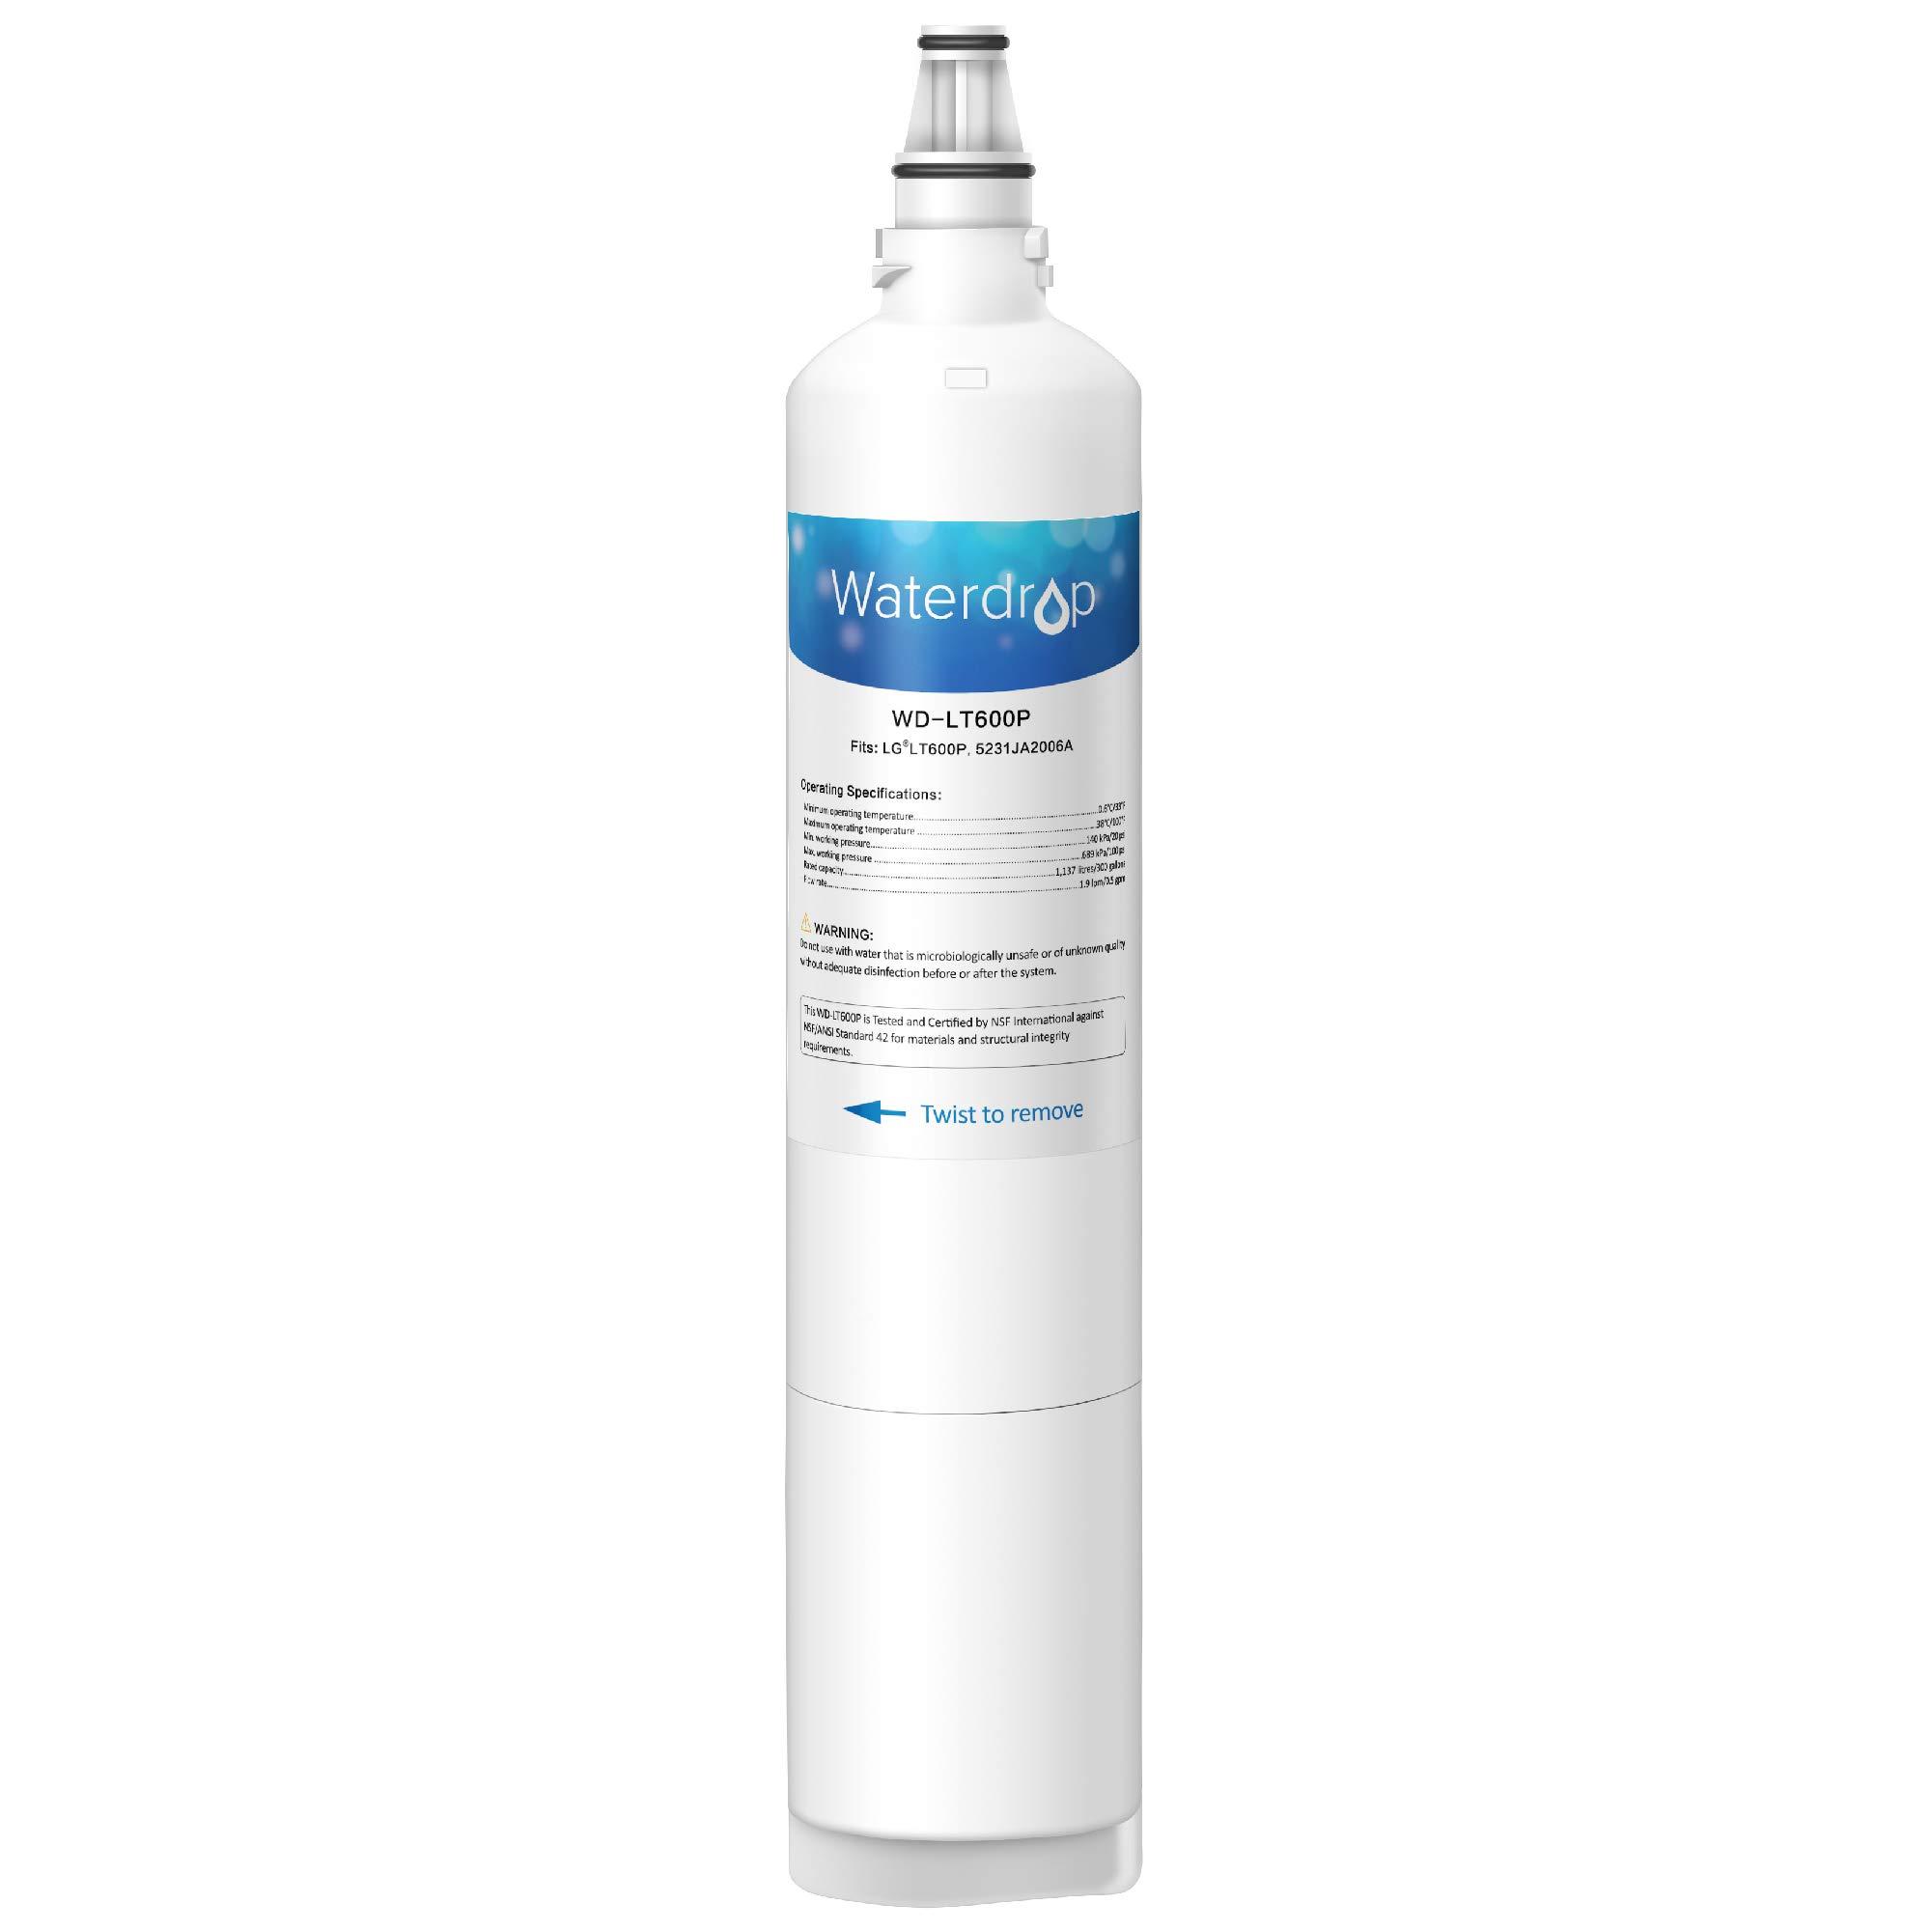 Waterdrop LT600P Replacemnet Refrigerator Water Filter, Compatible with LG LT600P, 5231JA2006A, 5231JA2006B, KENMORE 46-9990, 9990, 469990, Standard Series